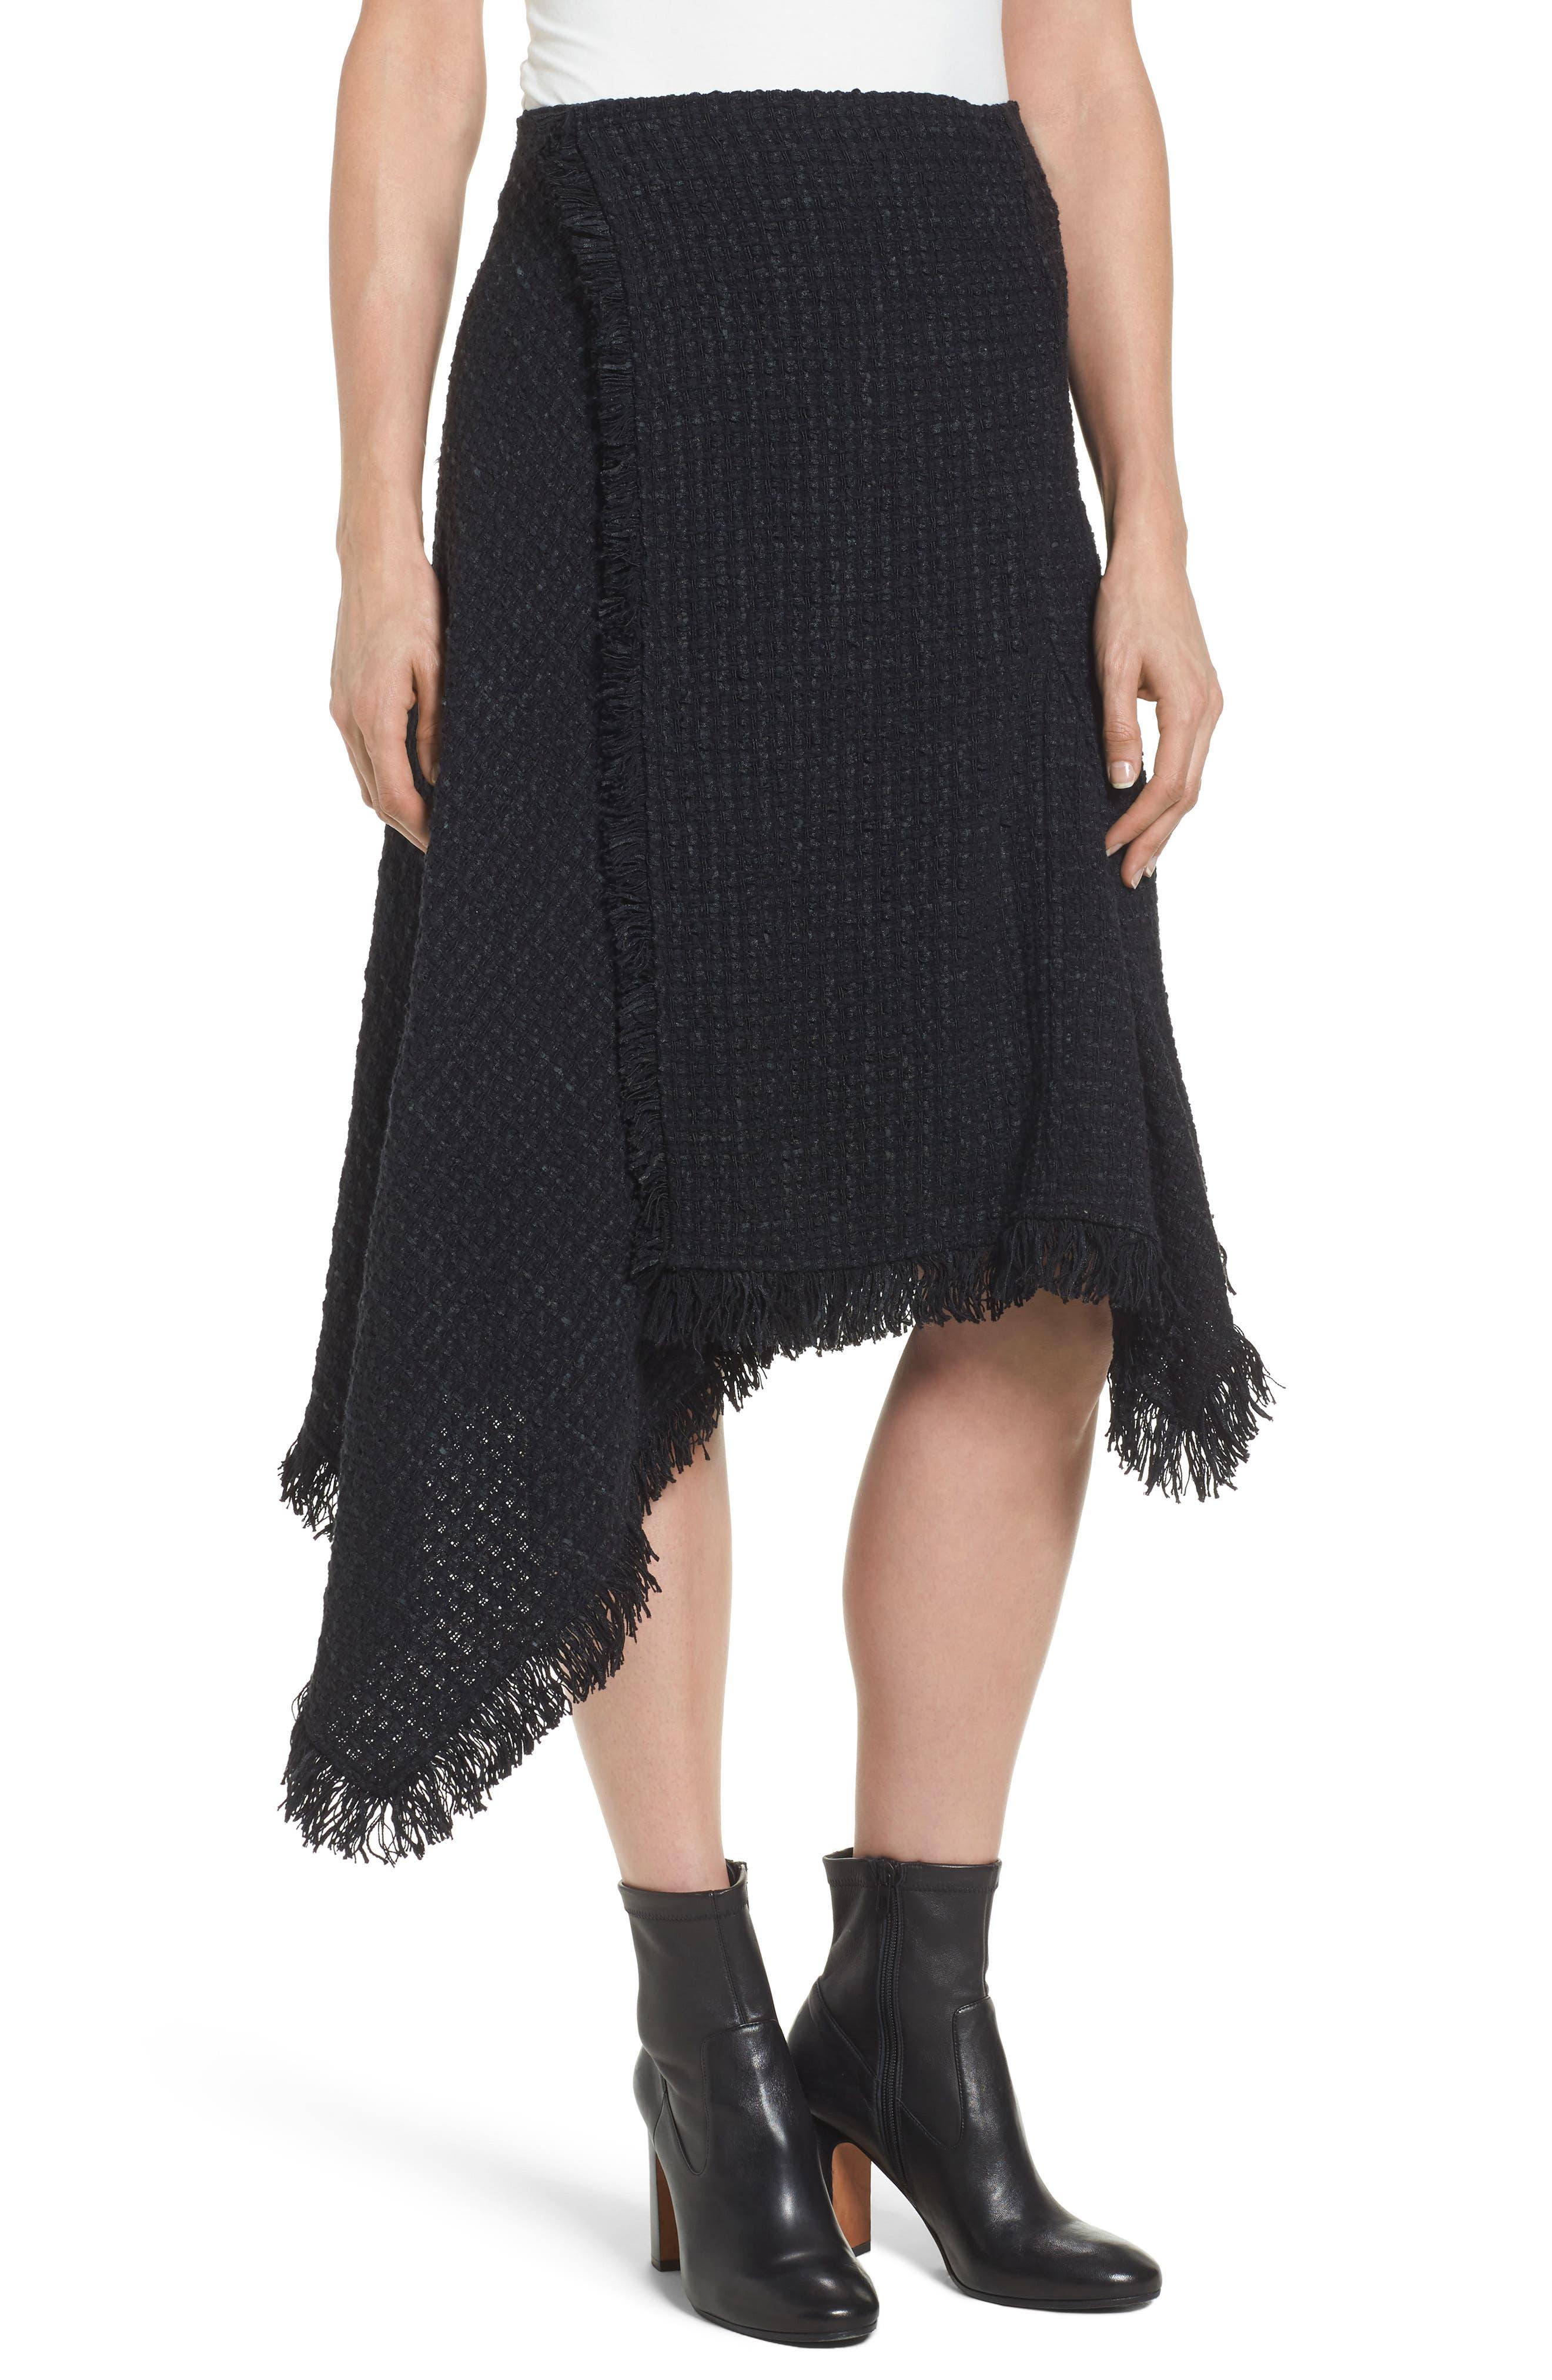 NIC + ZOE Majestic Tweed Skirt,                         Main,                         color, 004